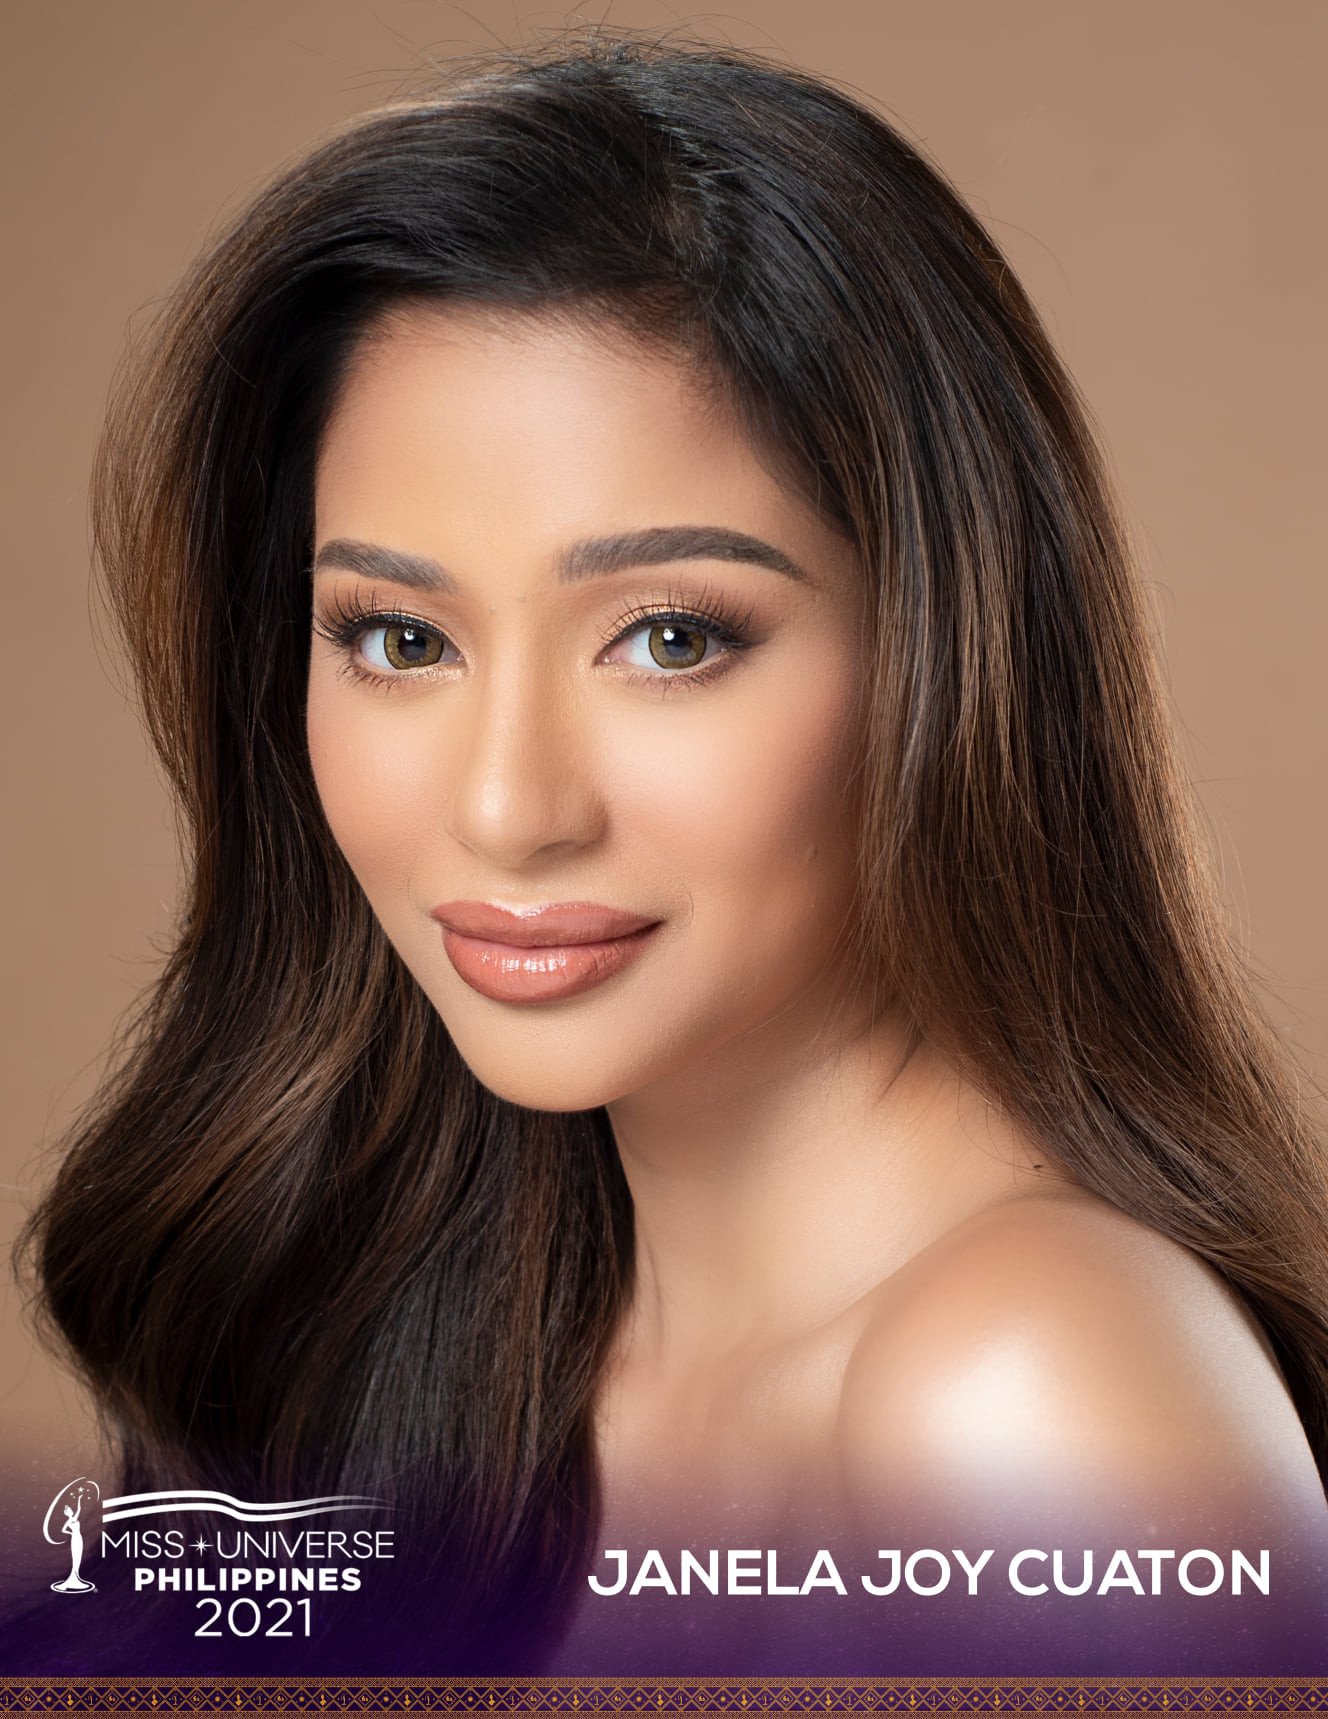 pre-candidatas a miss universe philippines 2021. - Página 3 AlqI99